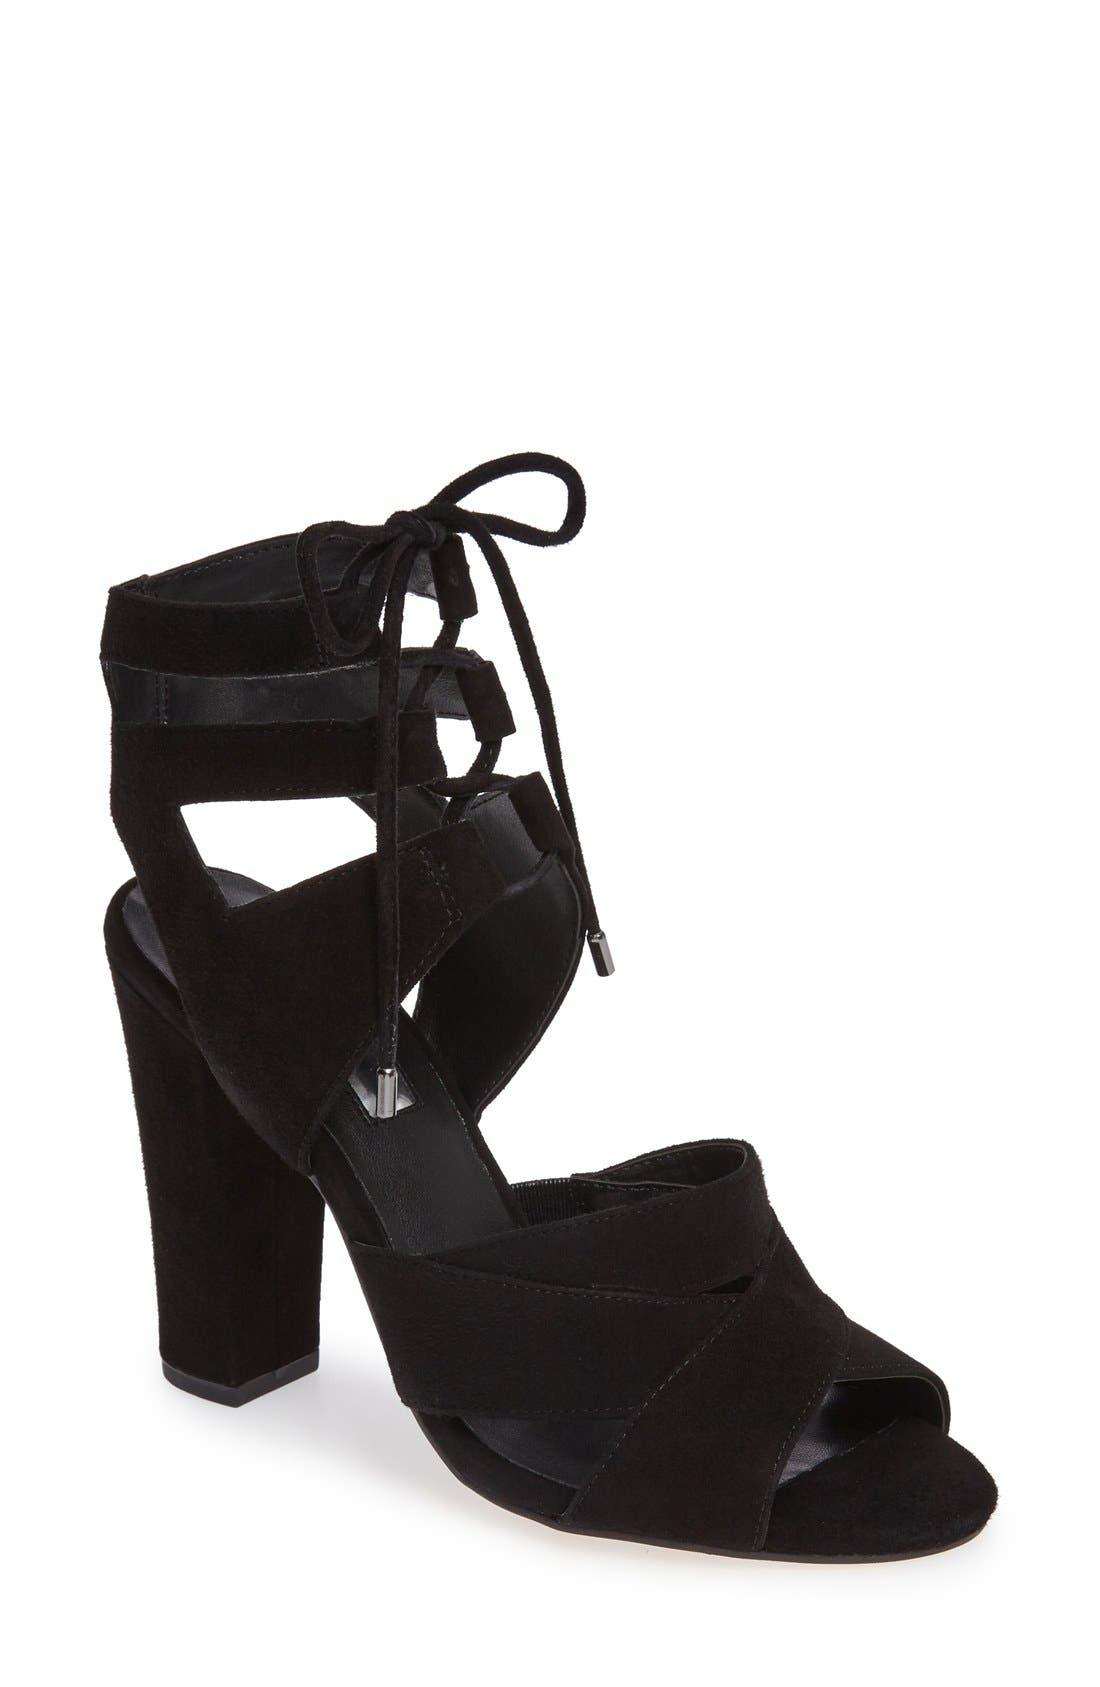 Alternate Image 1 Selected - Halogen® Lani Strappy Lace-Up Sandal (Women)